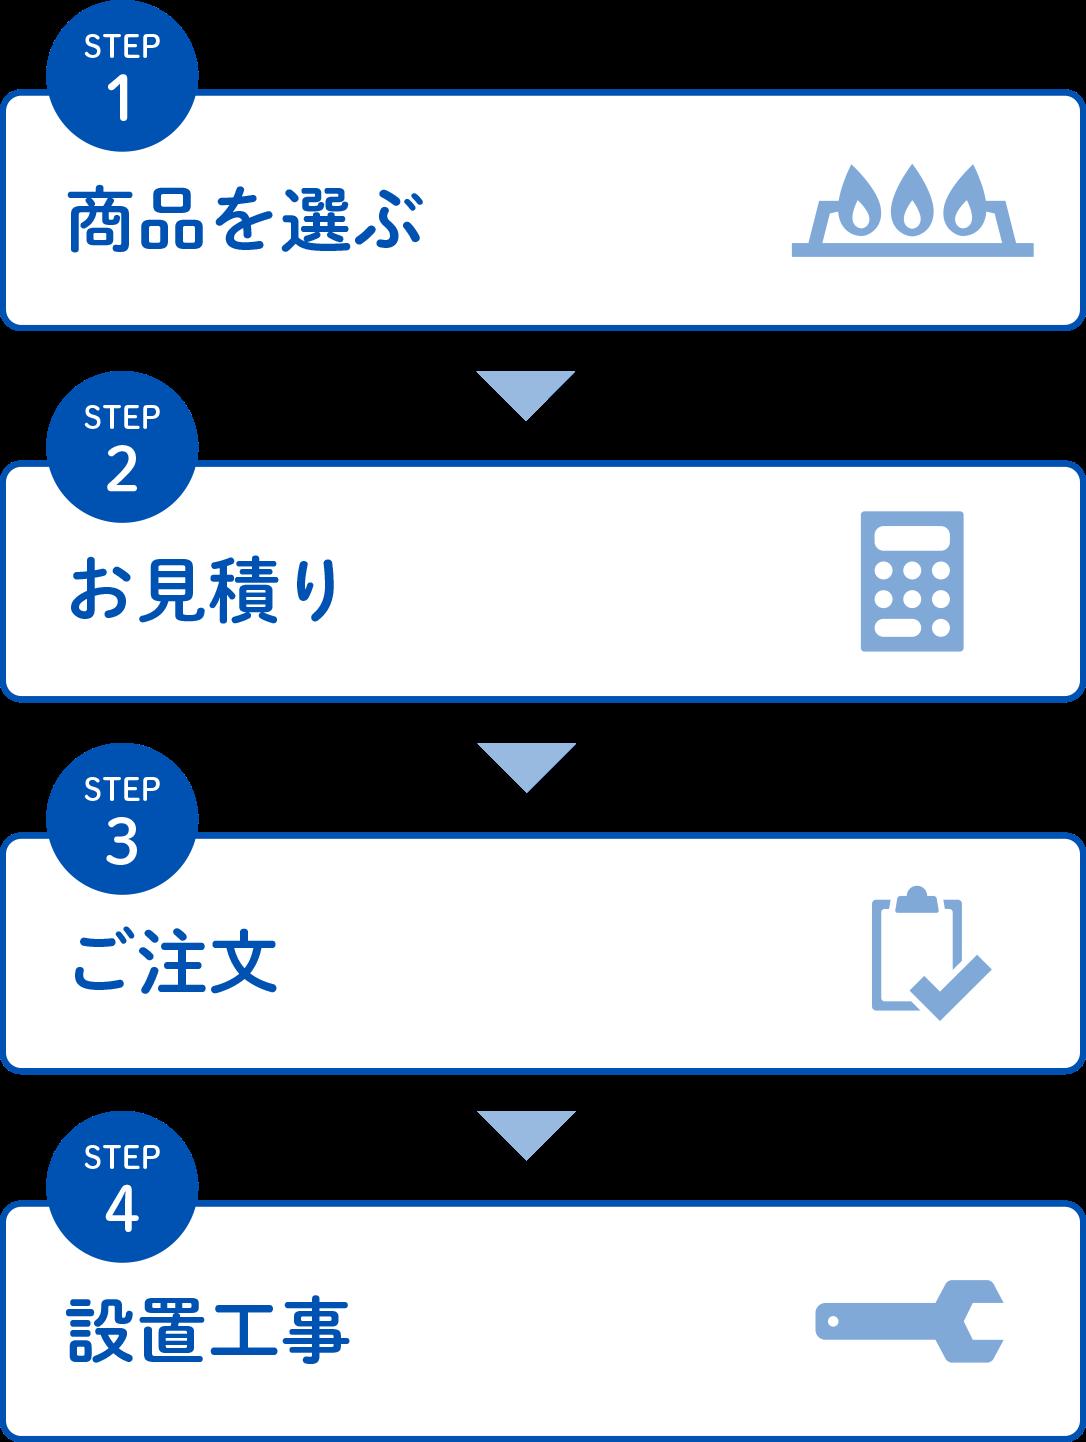 STEP1 商品を選ぶ STEP2 お見積り STEP3 ご注文 STEP4 設置工事